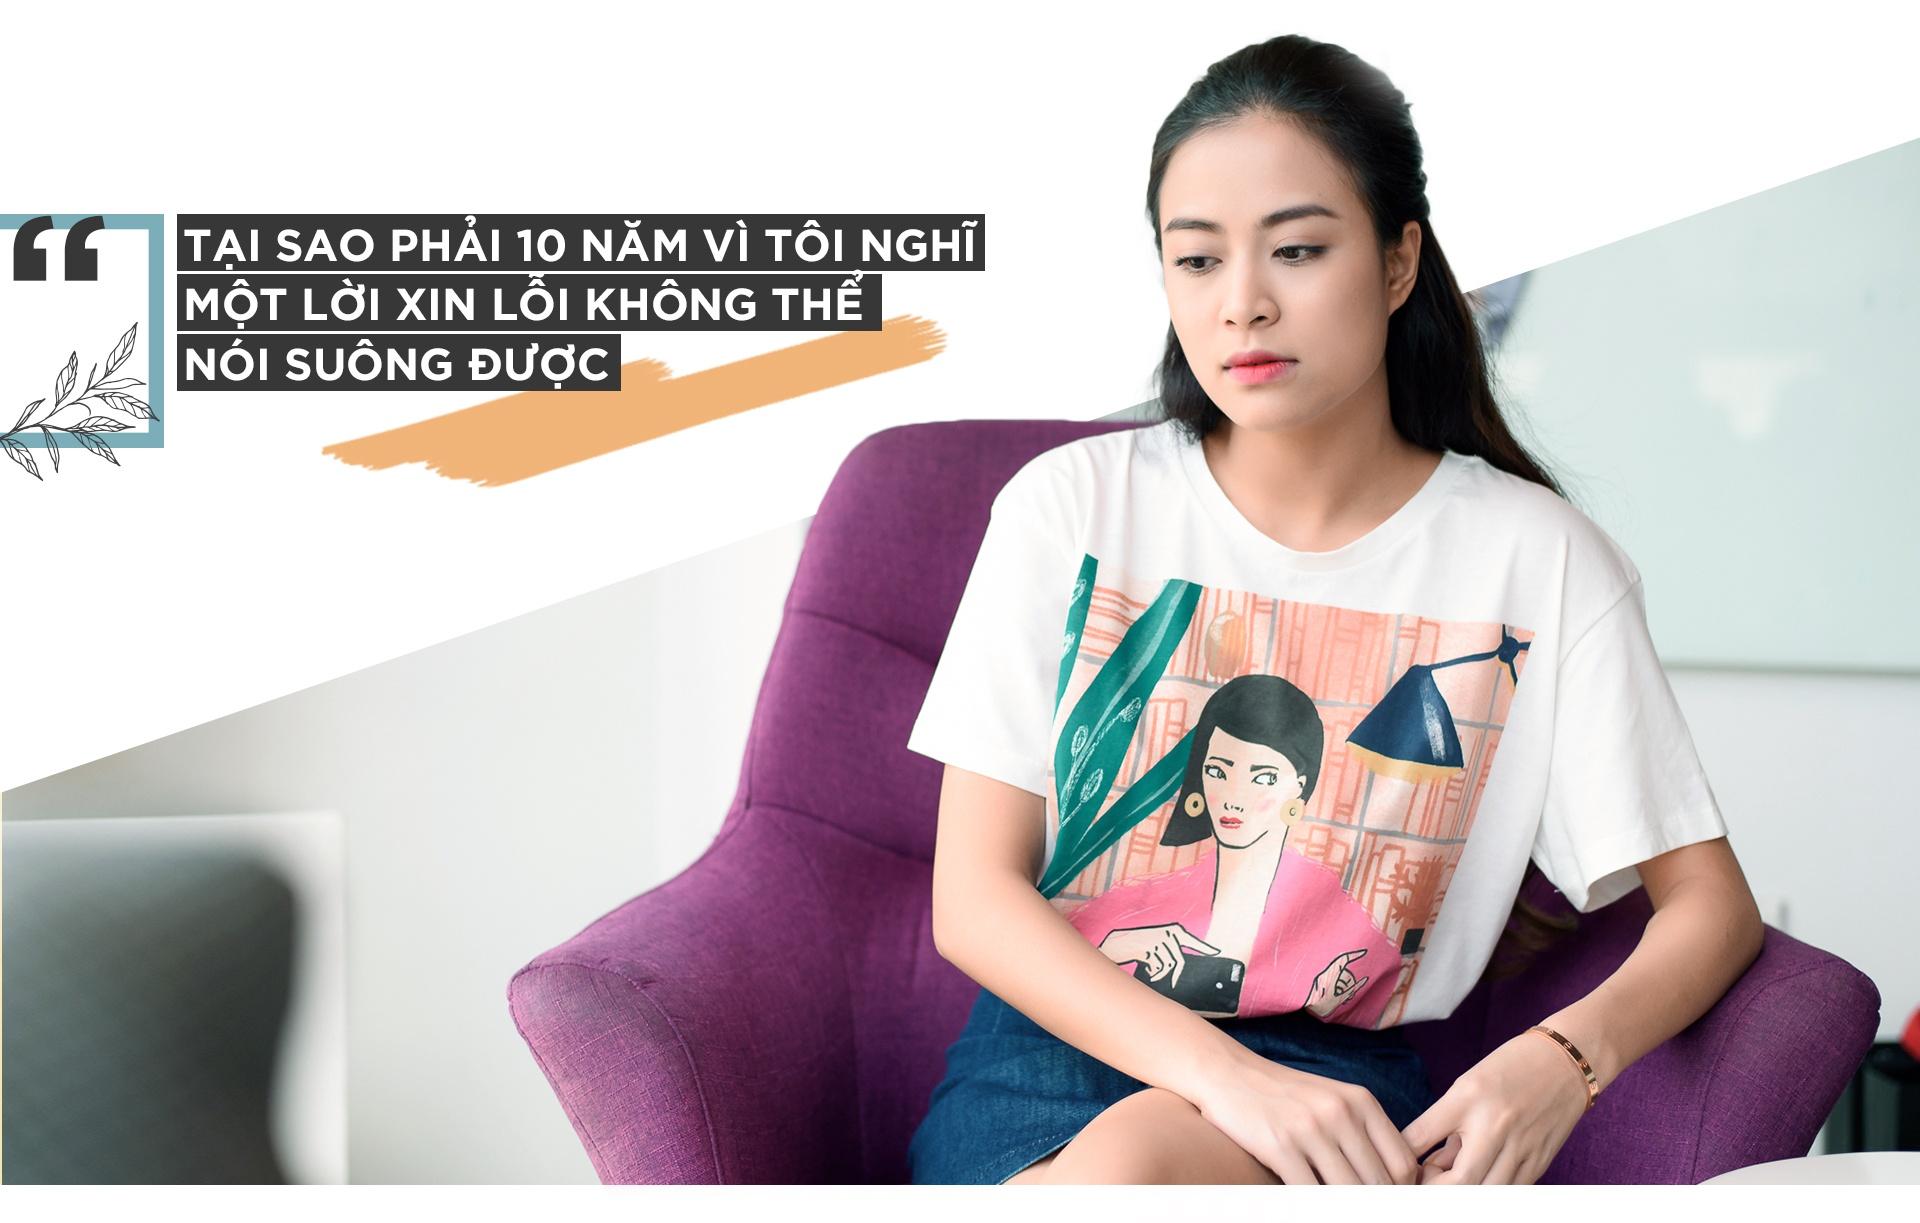 Hoang Thuy Linh khoc vi mang ban an 10 nam qua anh 5